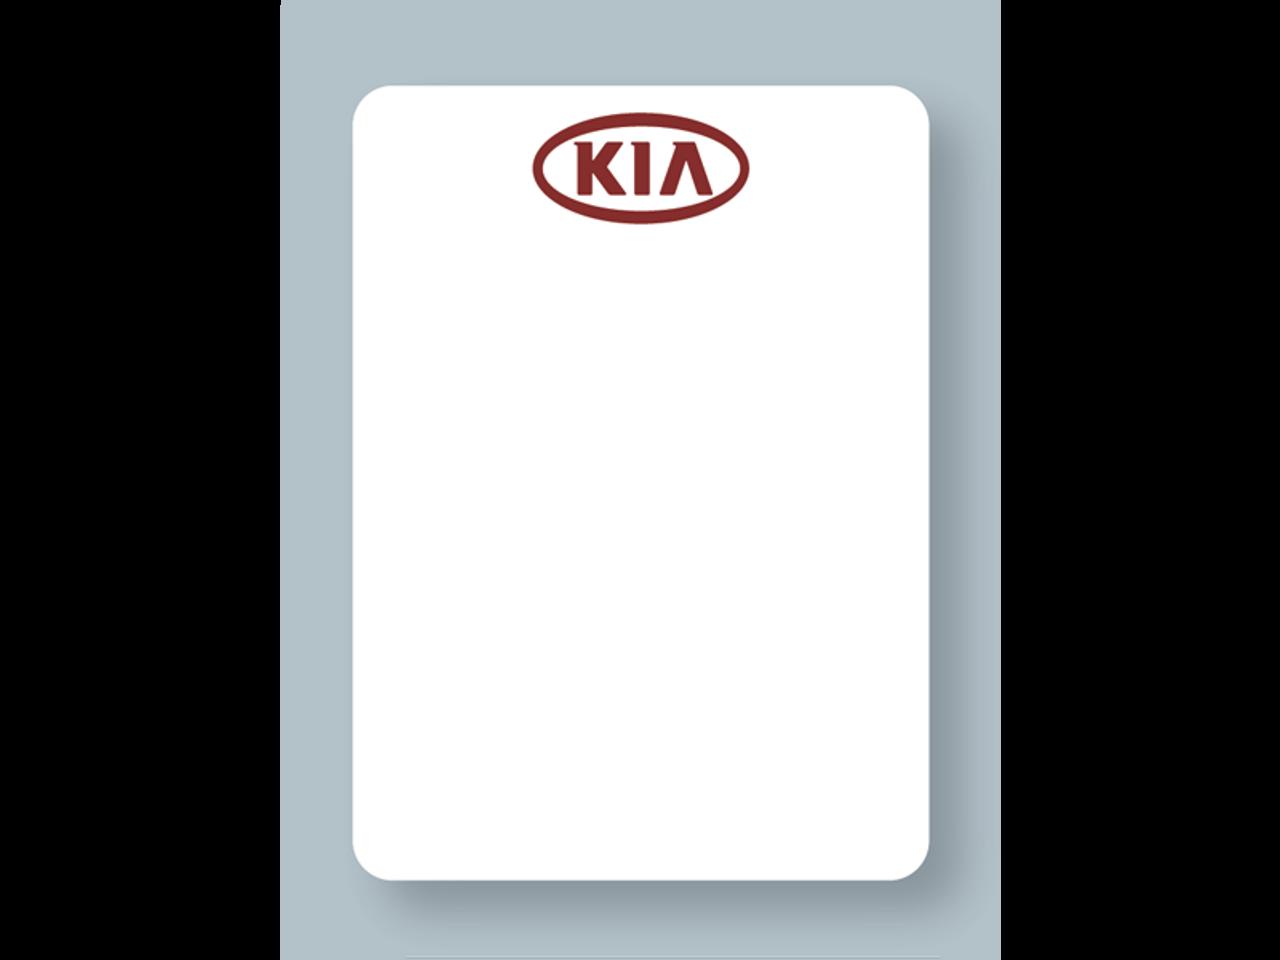 Kia Reminder Stickers - Printer Compatible - White Low-Tac